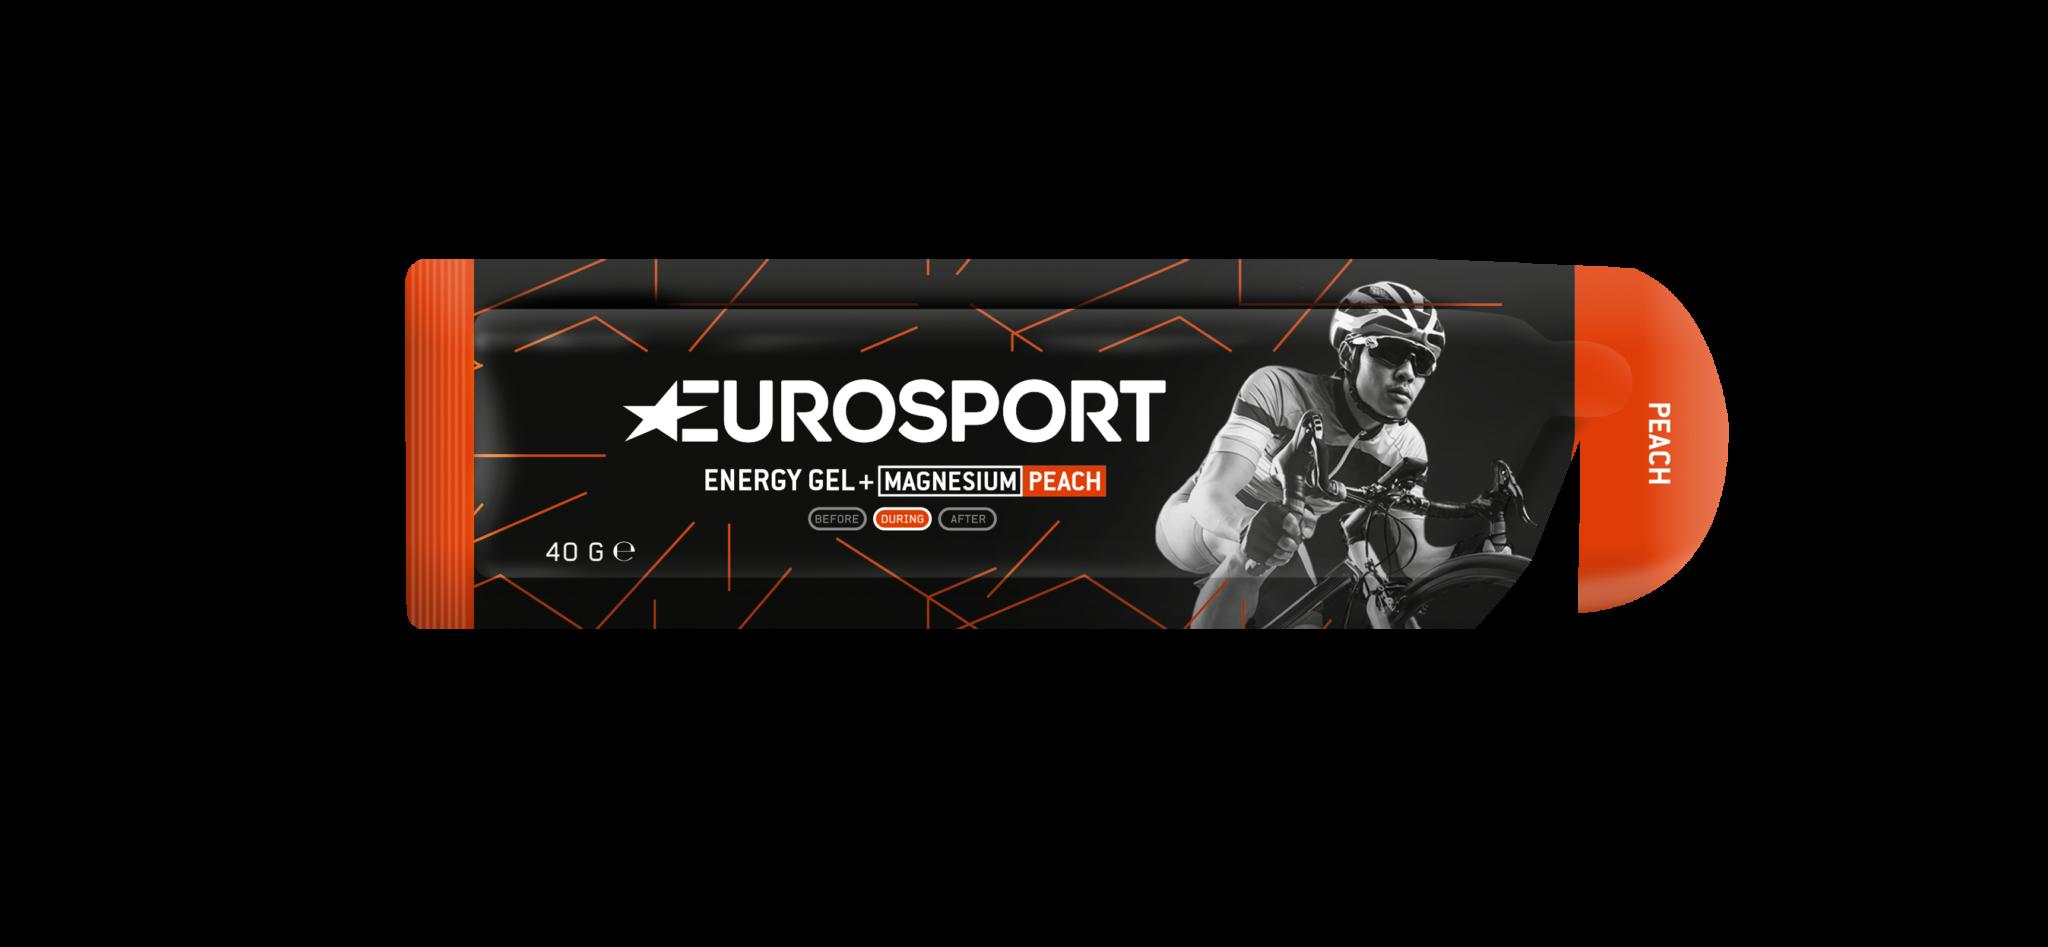 Eurosport - Energy Gel + Magnesium_Peach_3D_